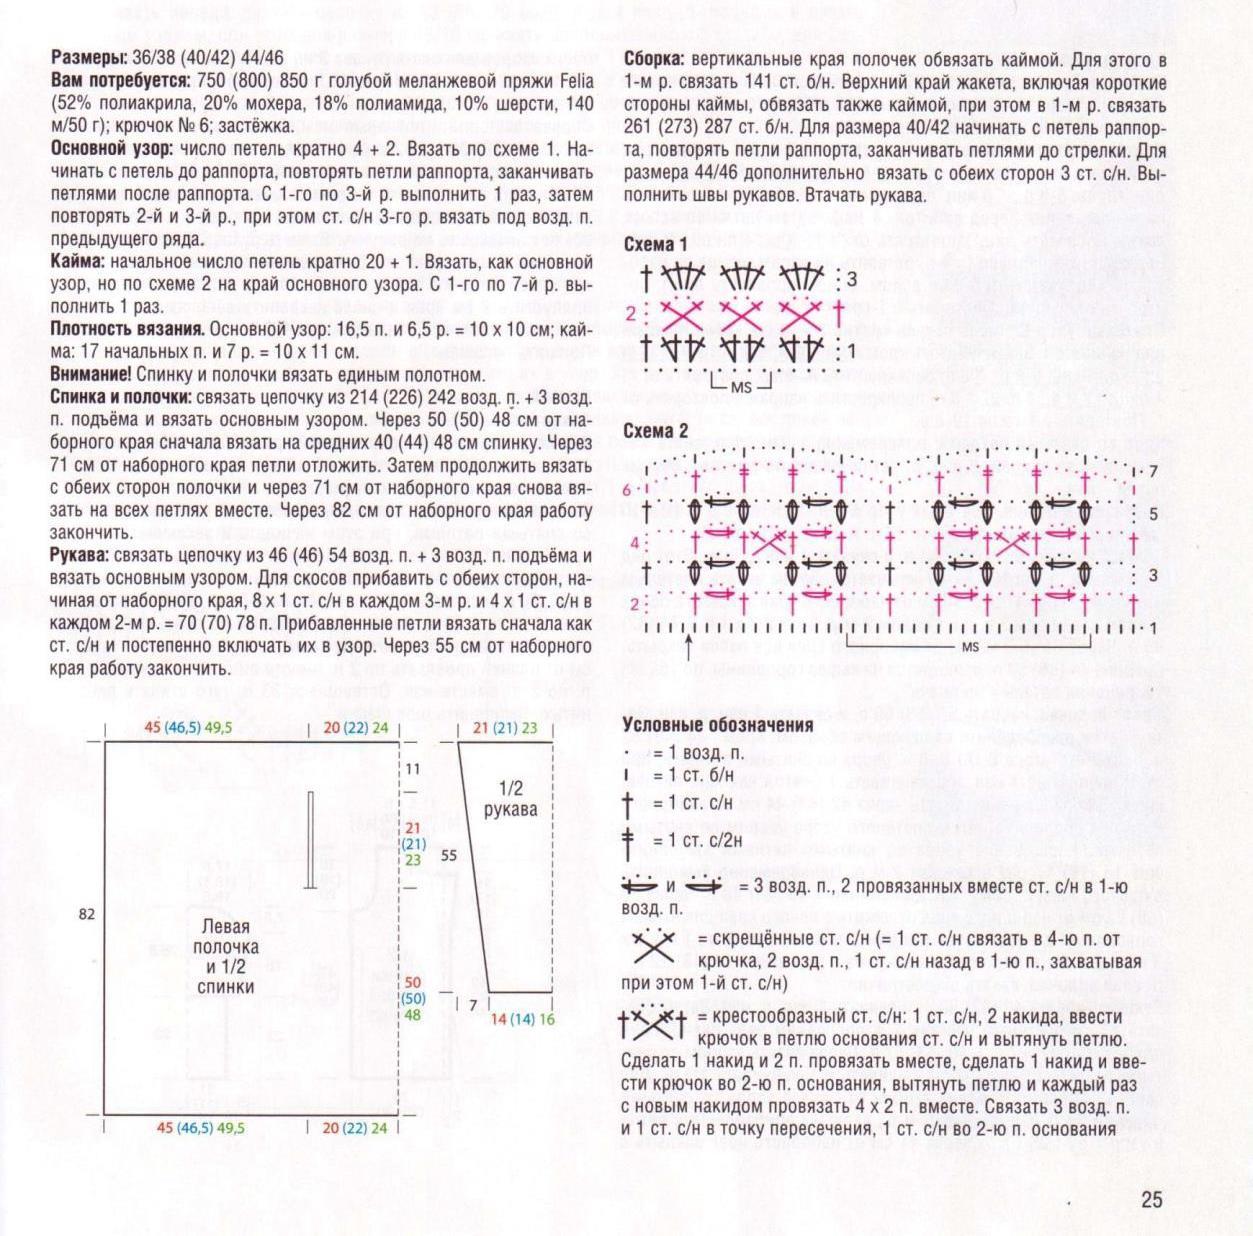 1982_DmIAn1113_24 (2)